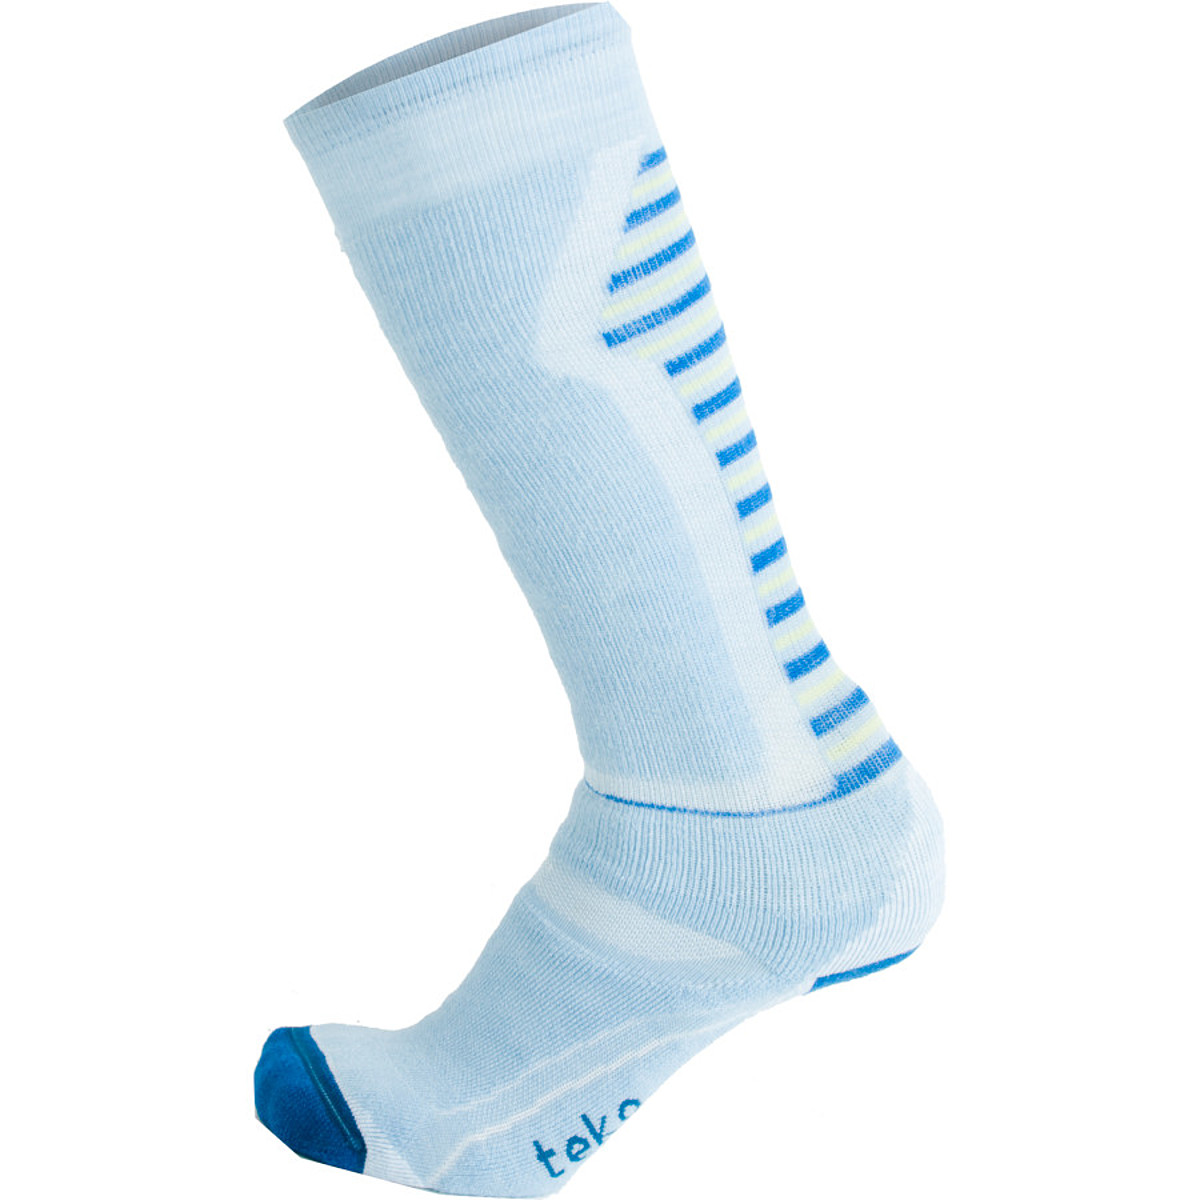 photo of a Teko snowsport sock